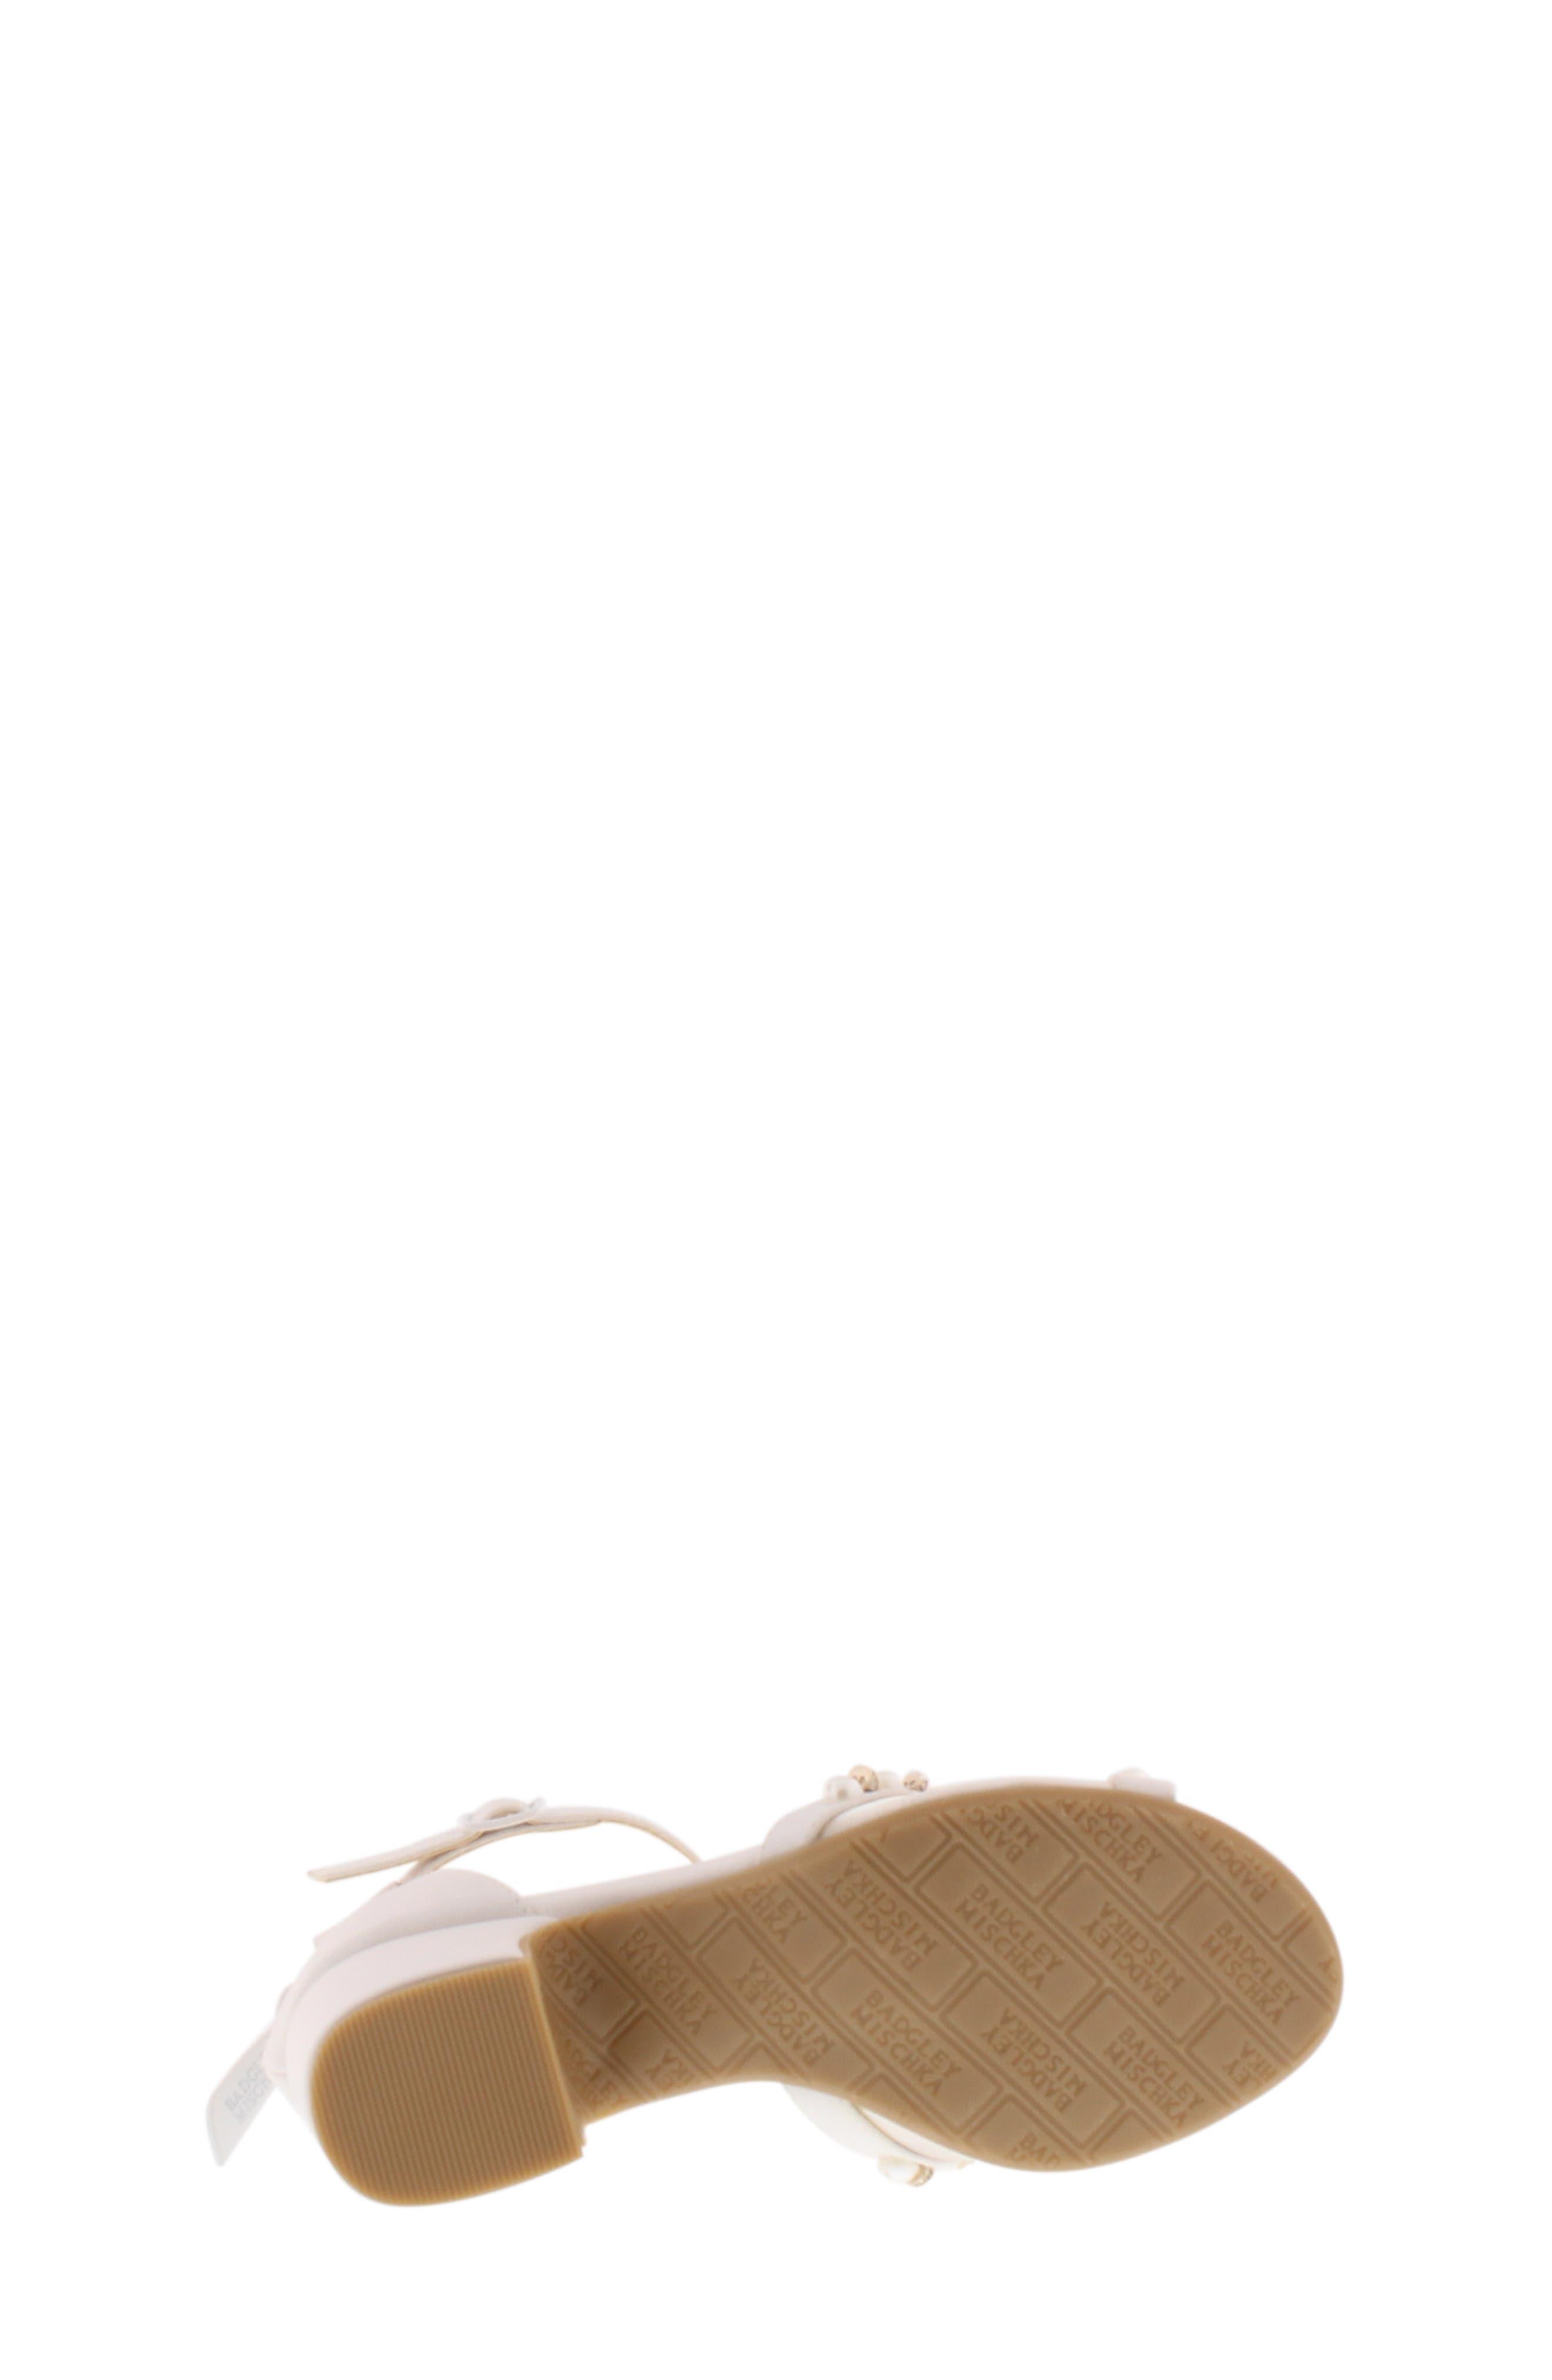 BADGLEY MISCHKA COLLECTION,                             Badgley Mischka Pernia Emily Embellished Sandal,                             Alternate thumbnail 5, color,                             WHITE SHIMMER